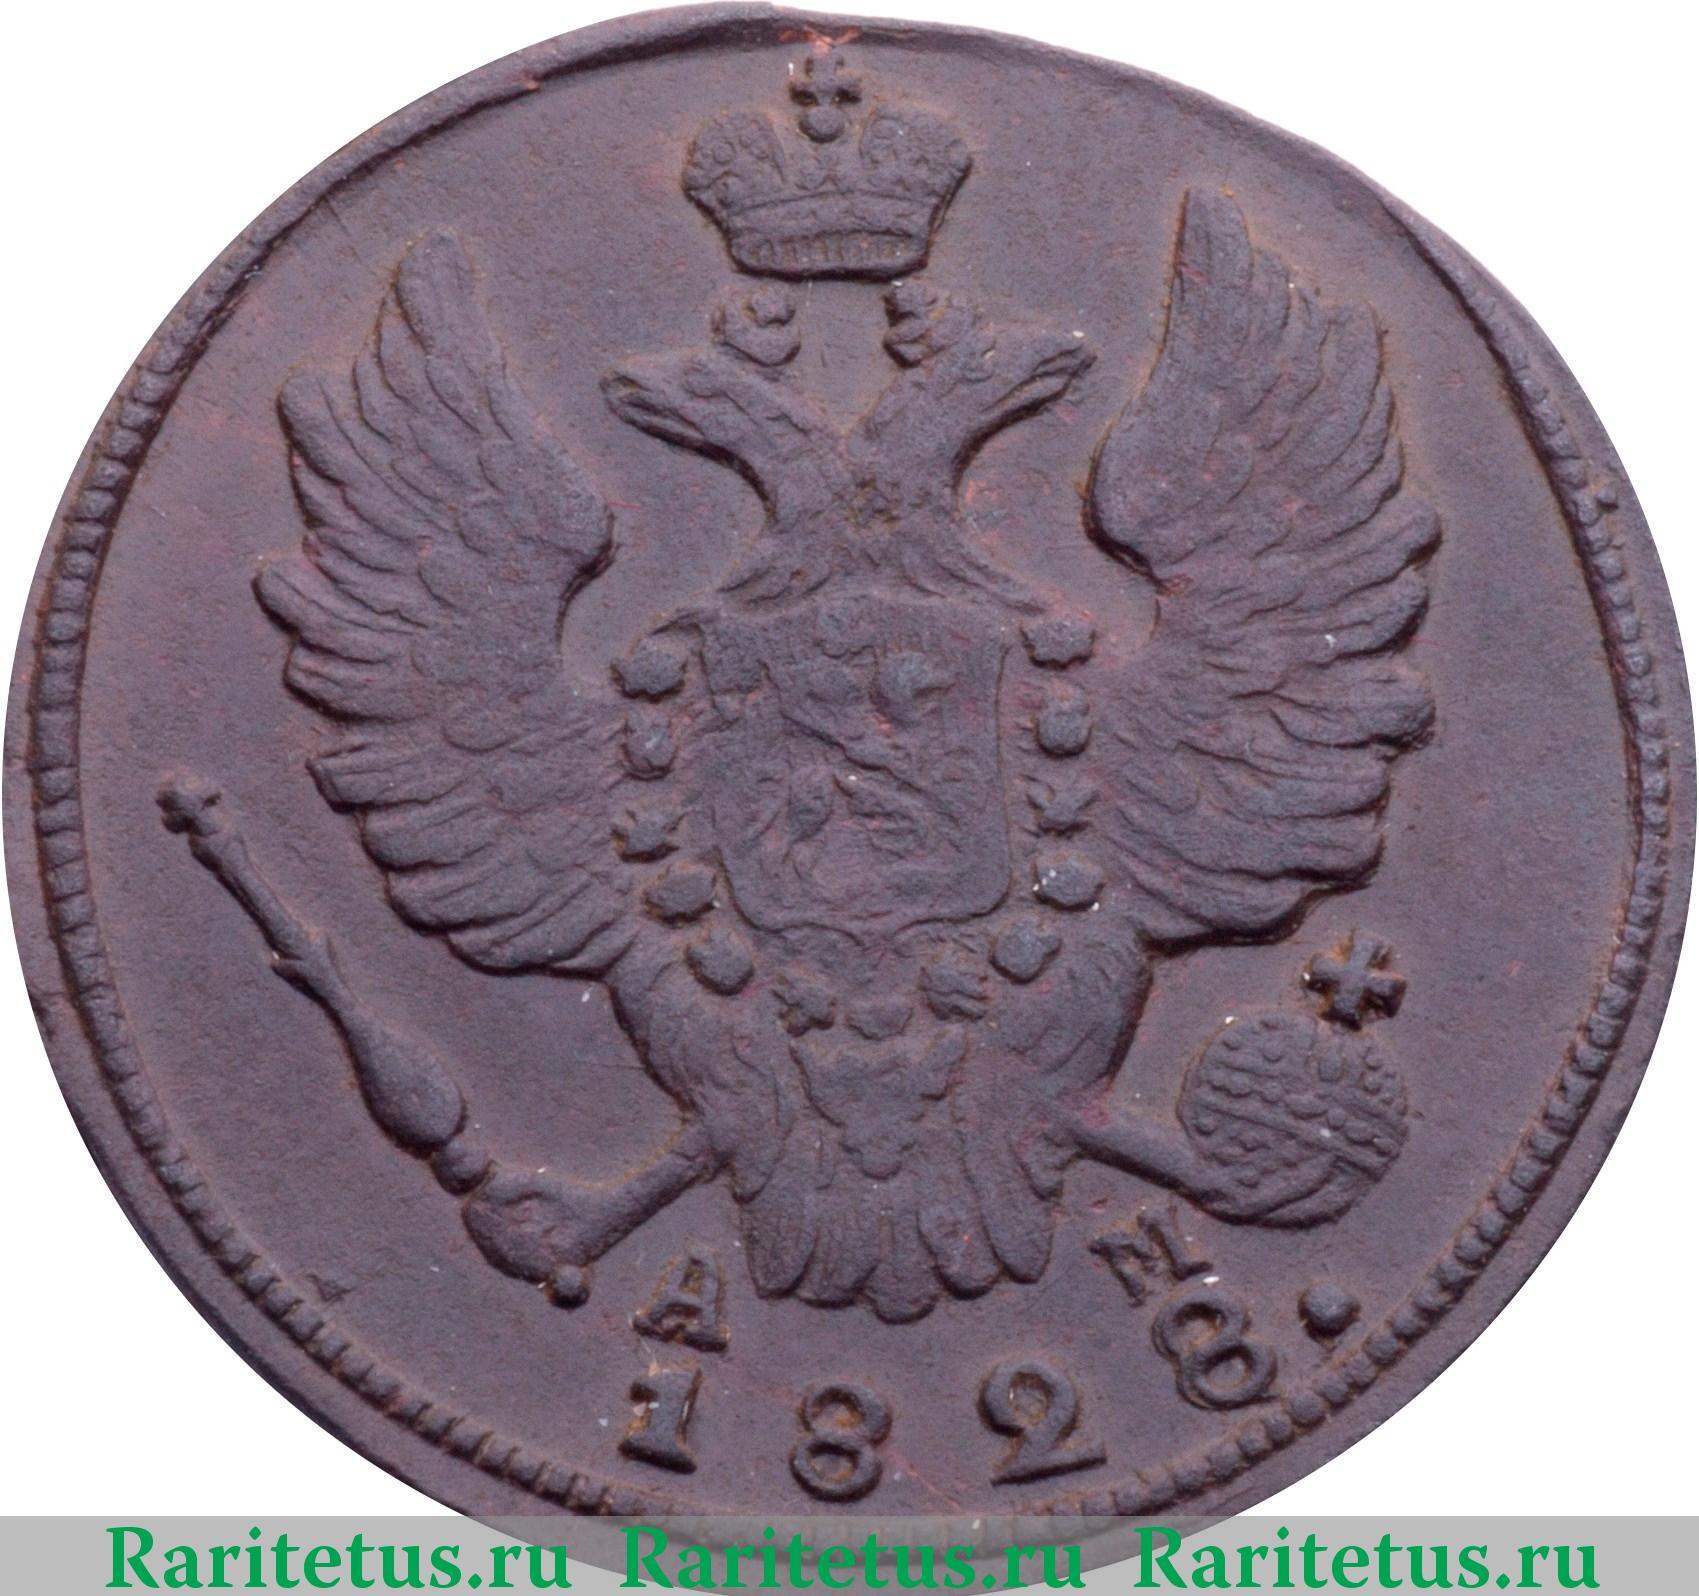 Аверс монеты 1 копейка 1828 года КМ-АМ